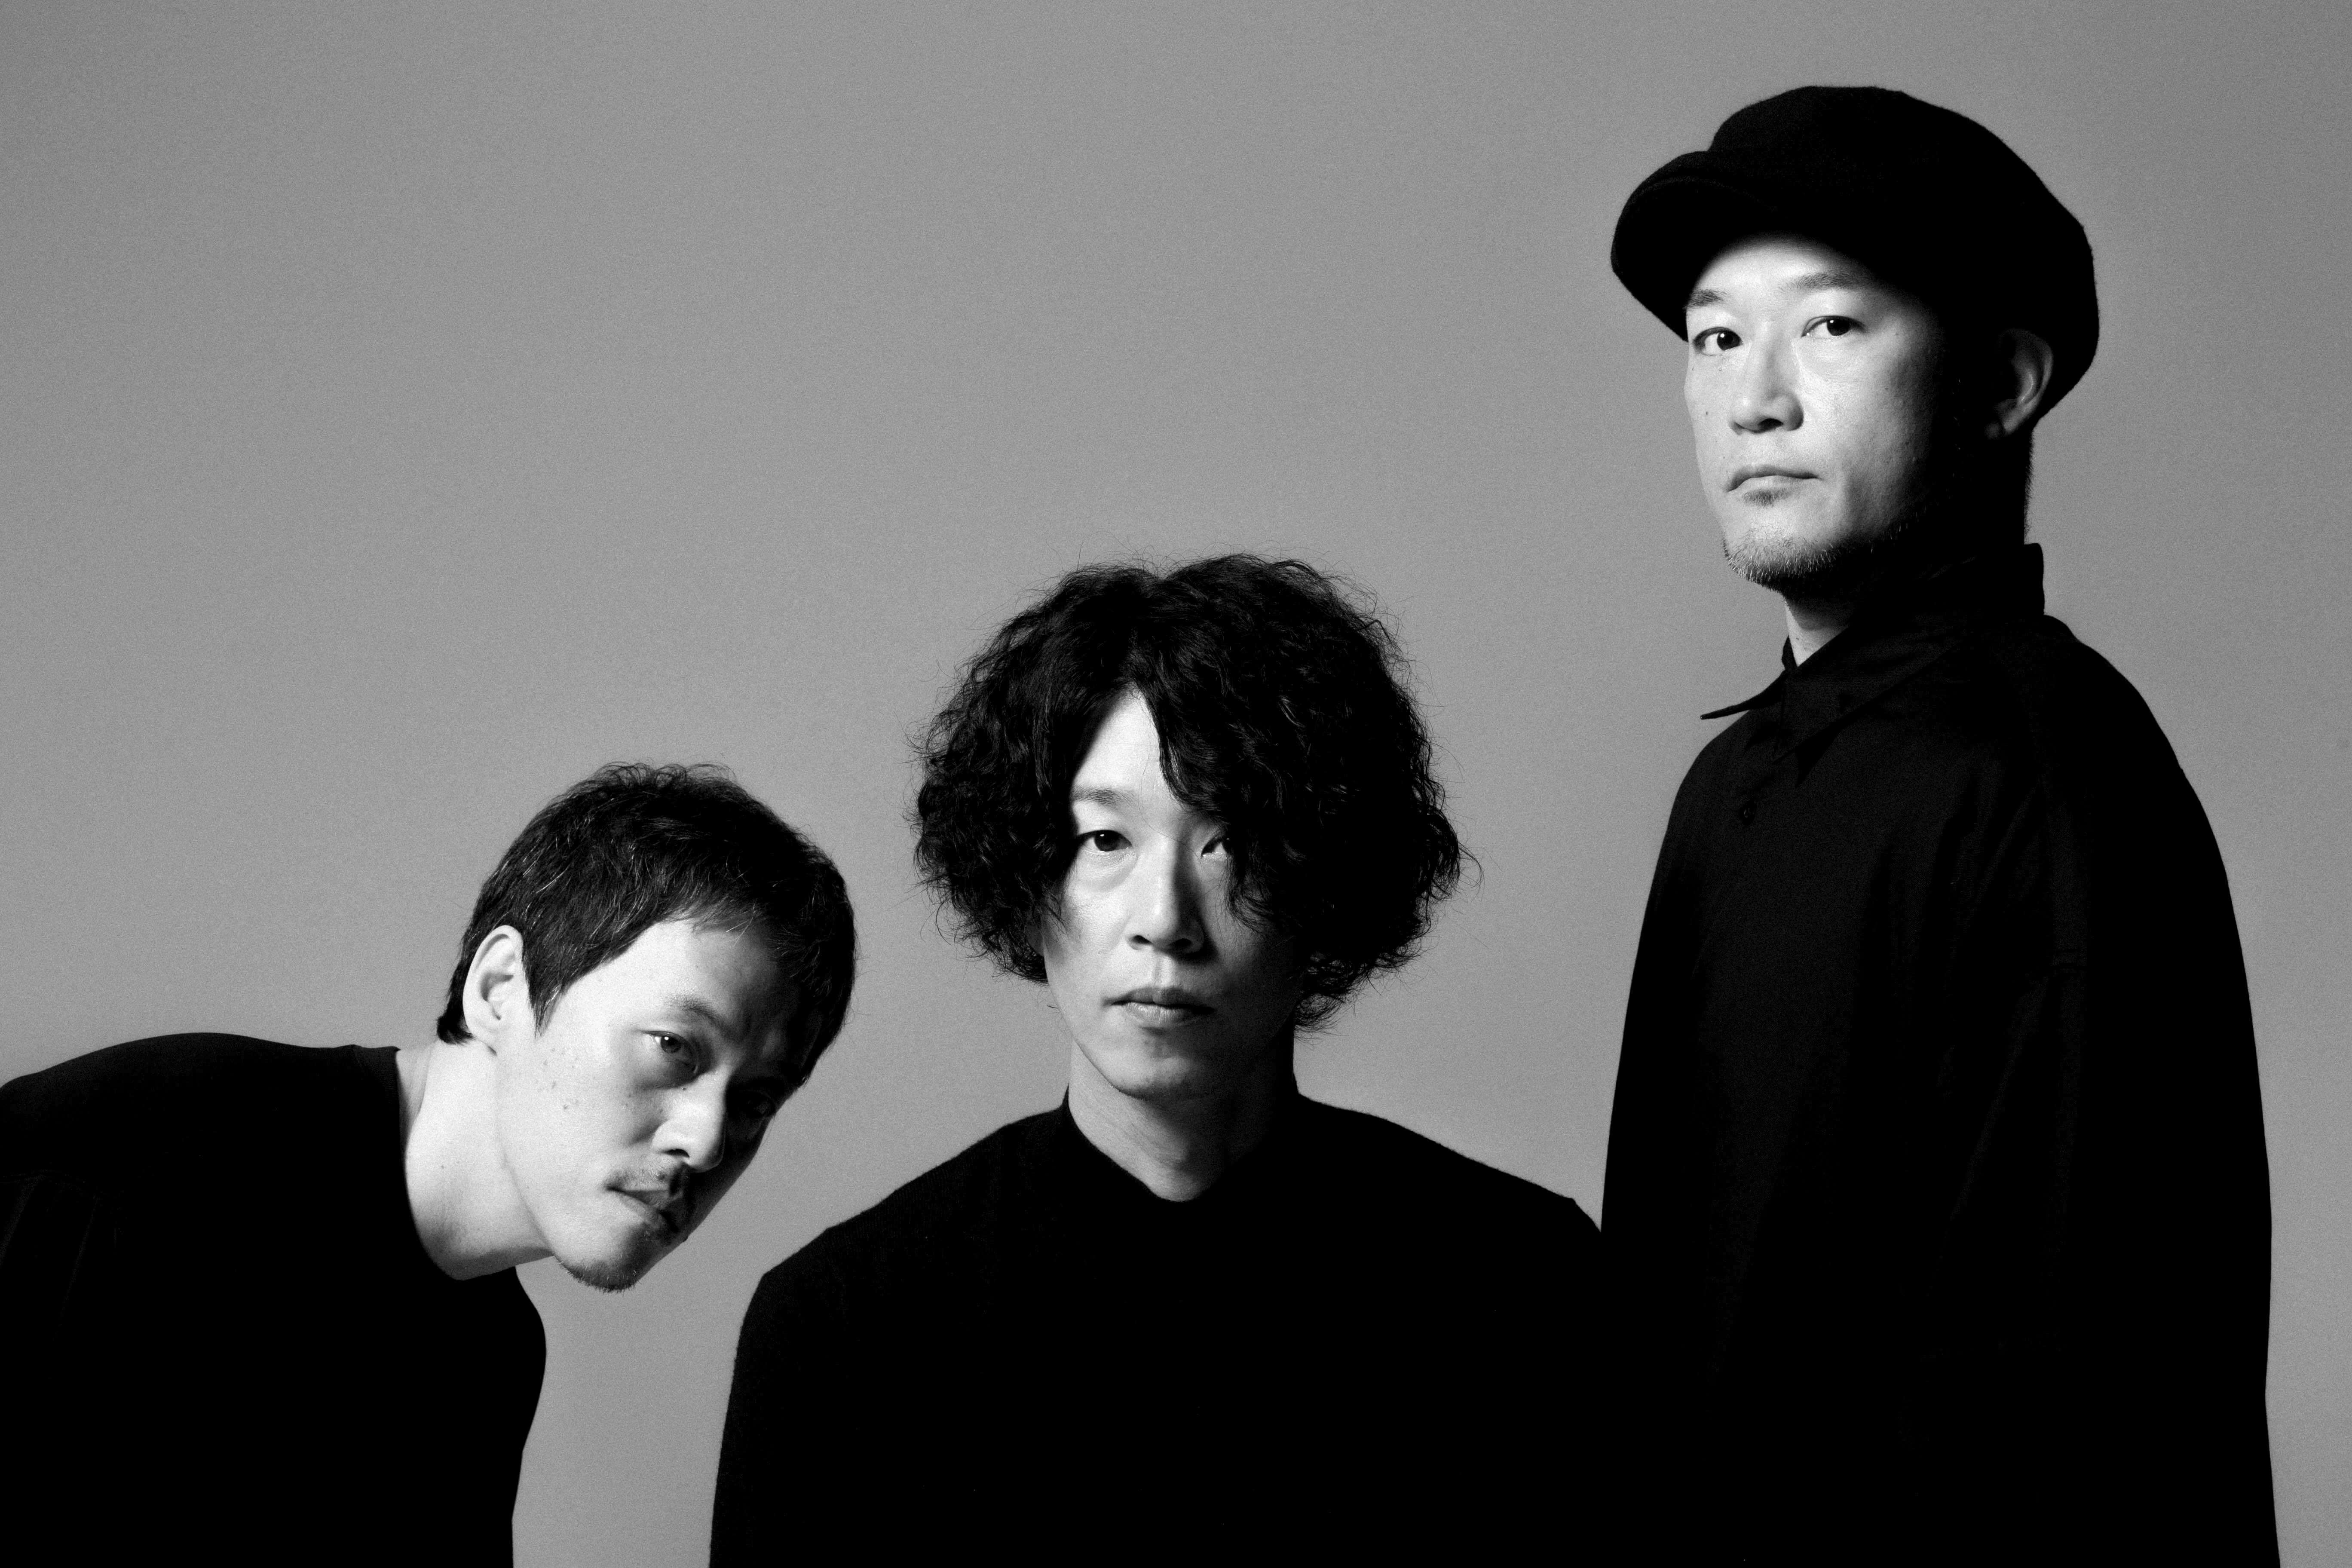 GRAPEVINE、2019年秋の東名阪ワンマンツアー「GRAPEVINE FALL TOUR」開催決定